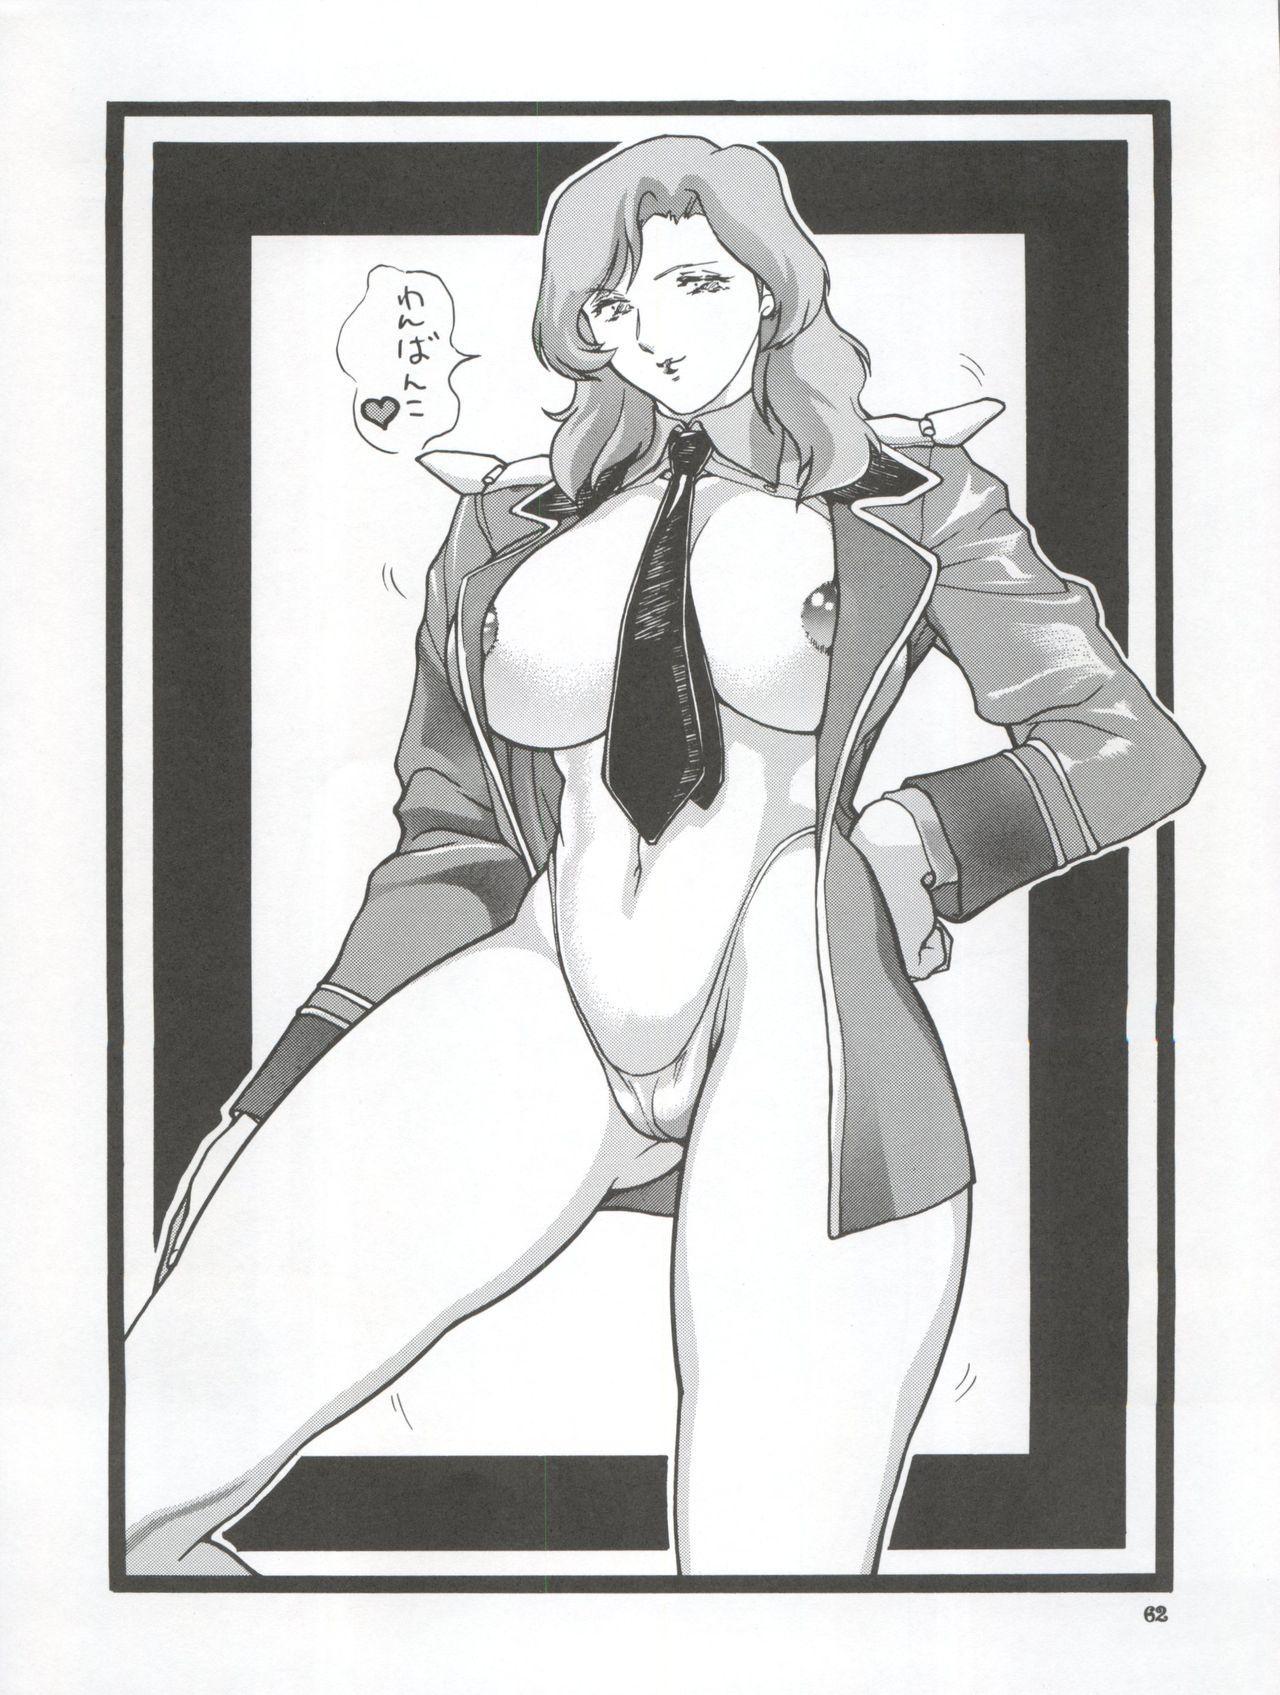 NEXT Climax Magazine 3 Gundam Series 61